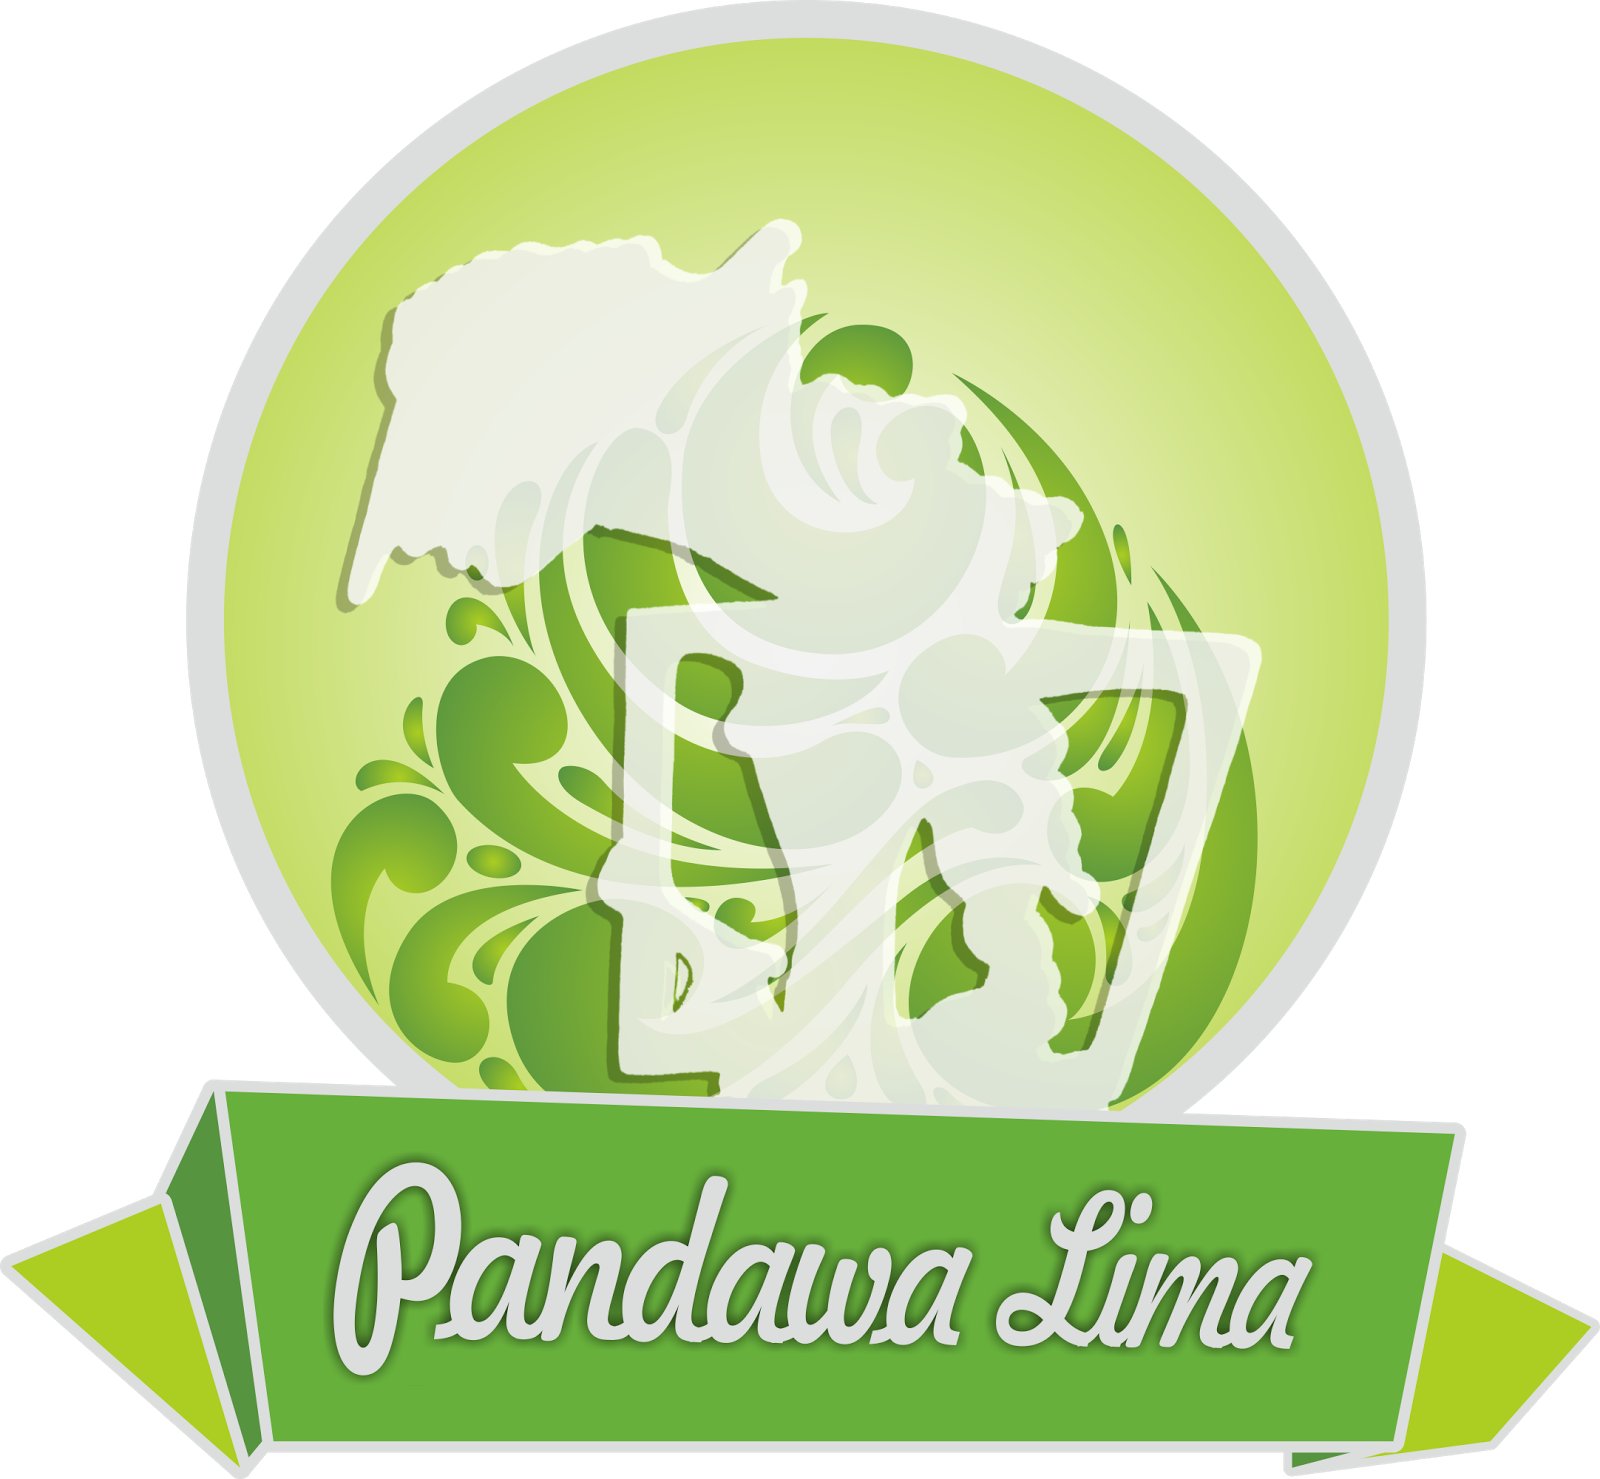 PandawaLima_MasterOfManagementUniversitasGadjahMada_Indonesia_TeamLogo.png